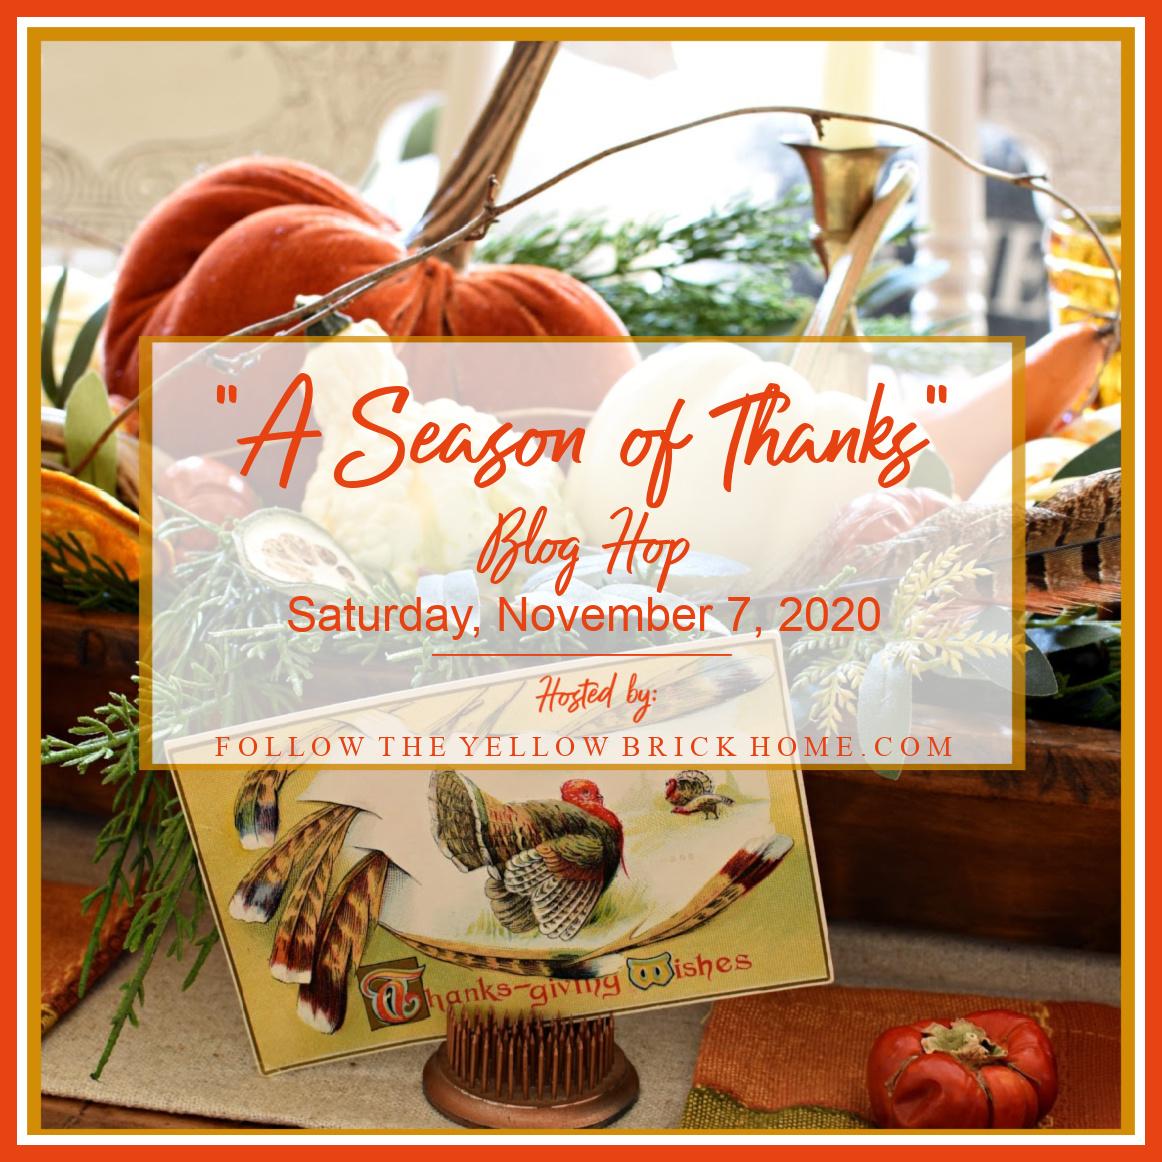 Season of Thanks blog hop